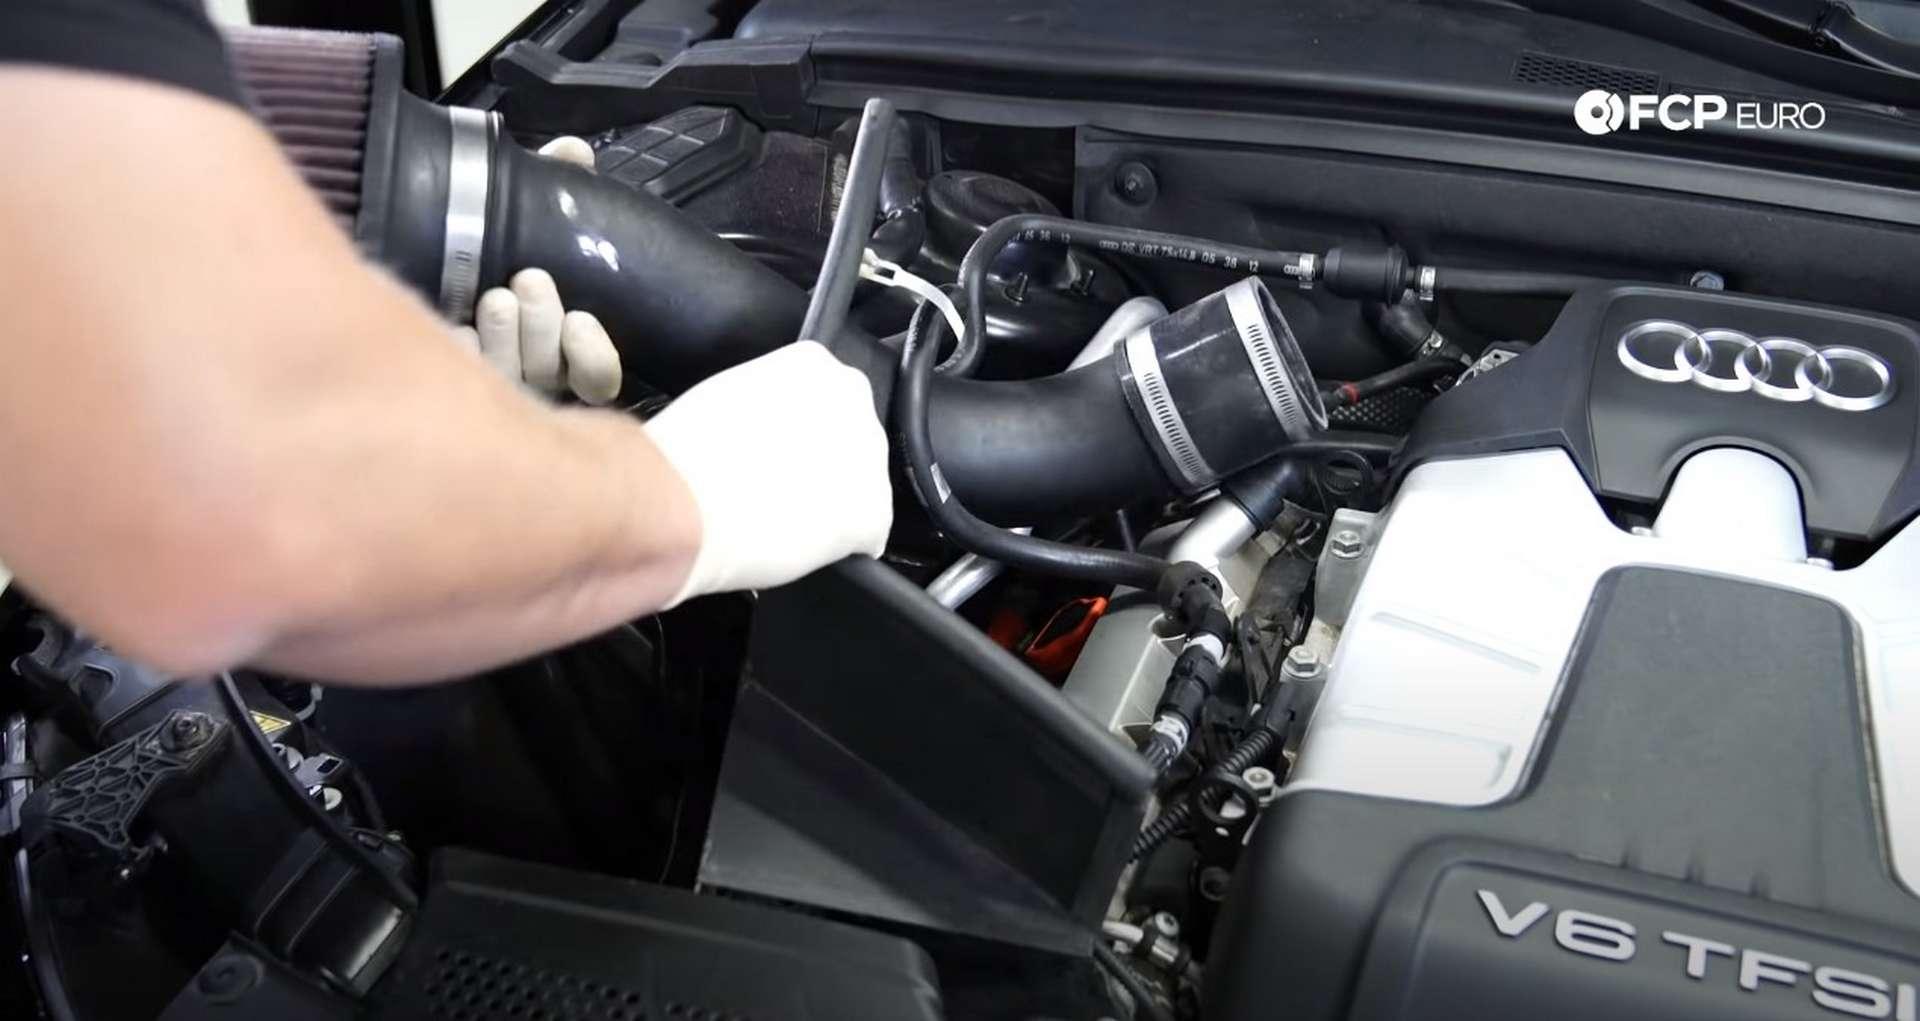 DIY Audi 3.0t Walnut Blasting Intake Valves removing the intake assembly